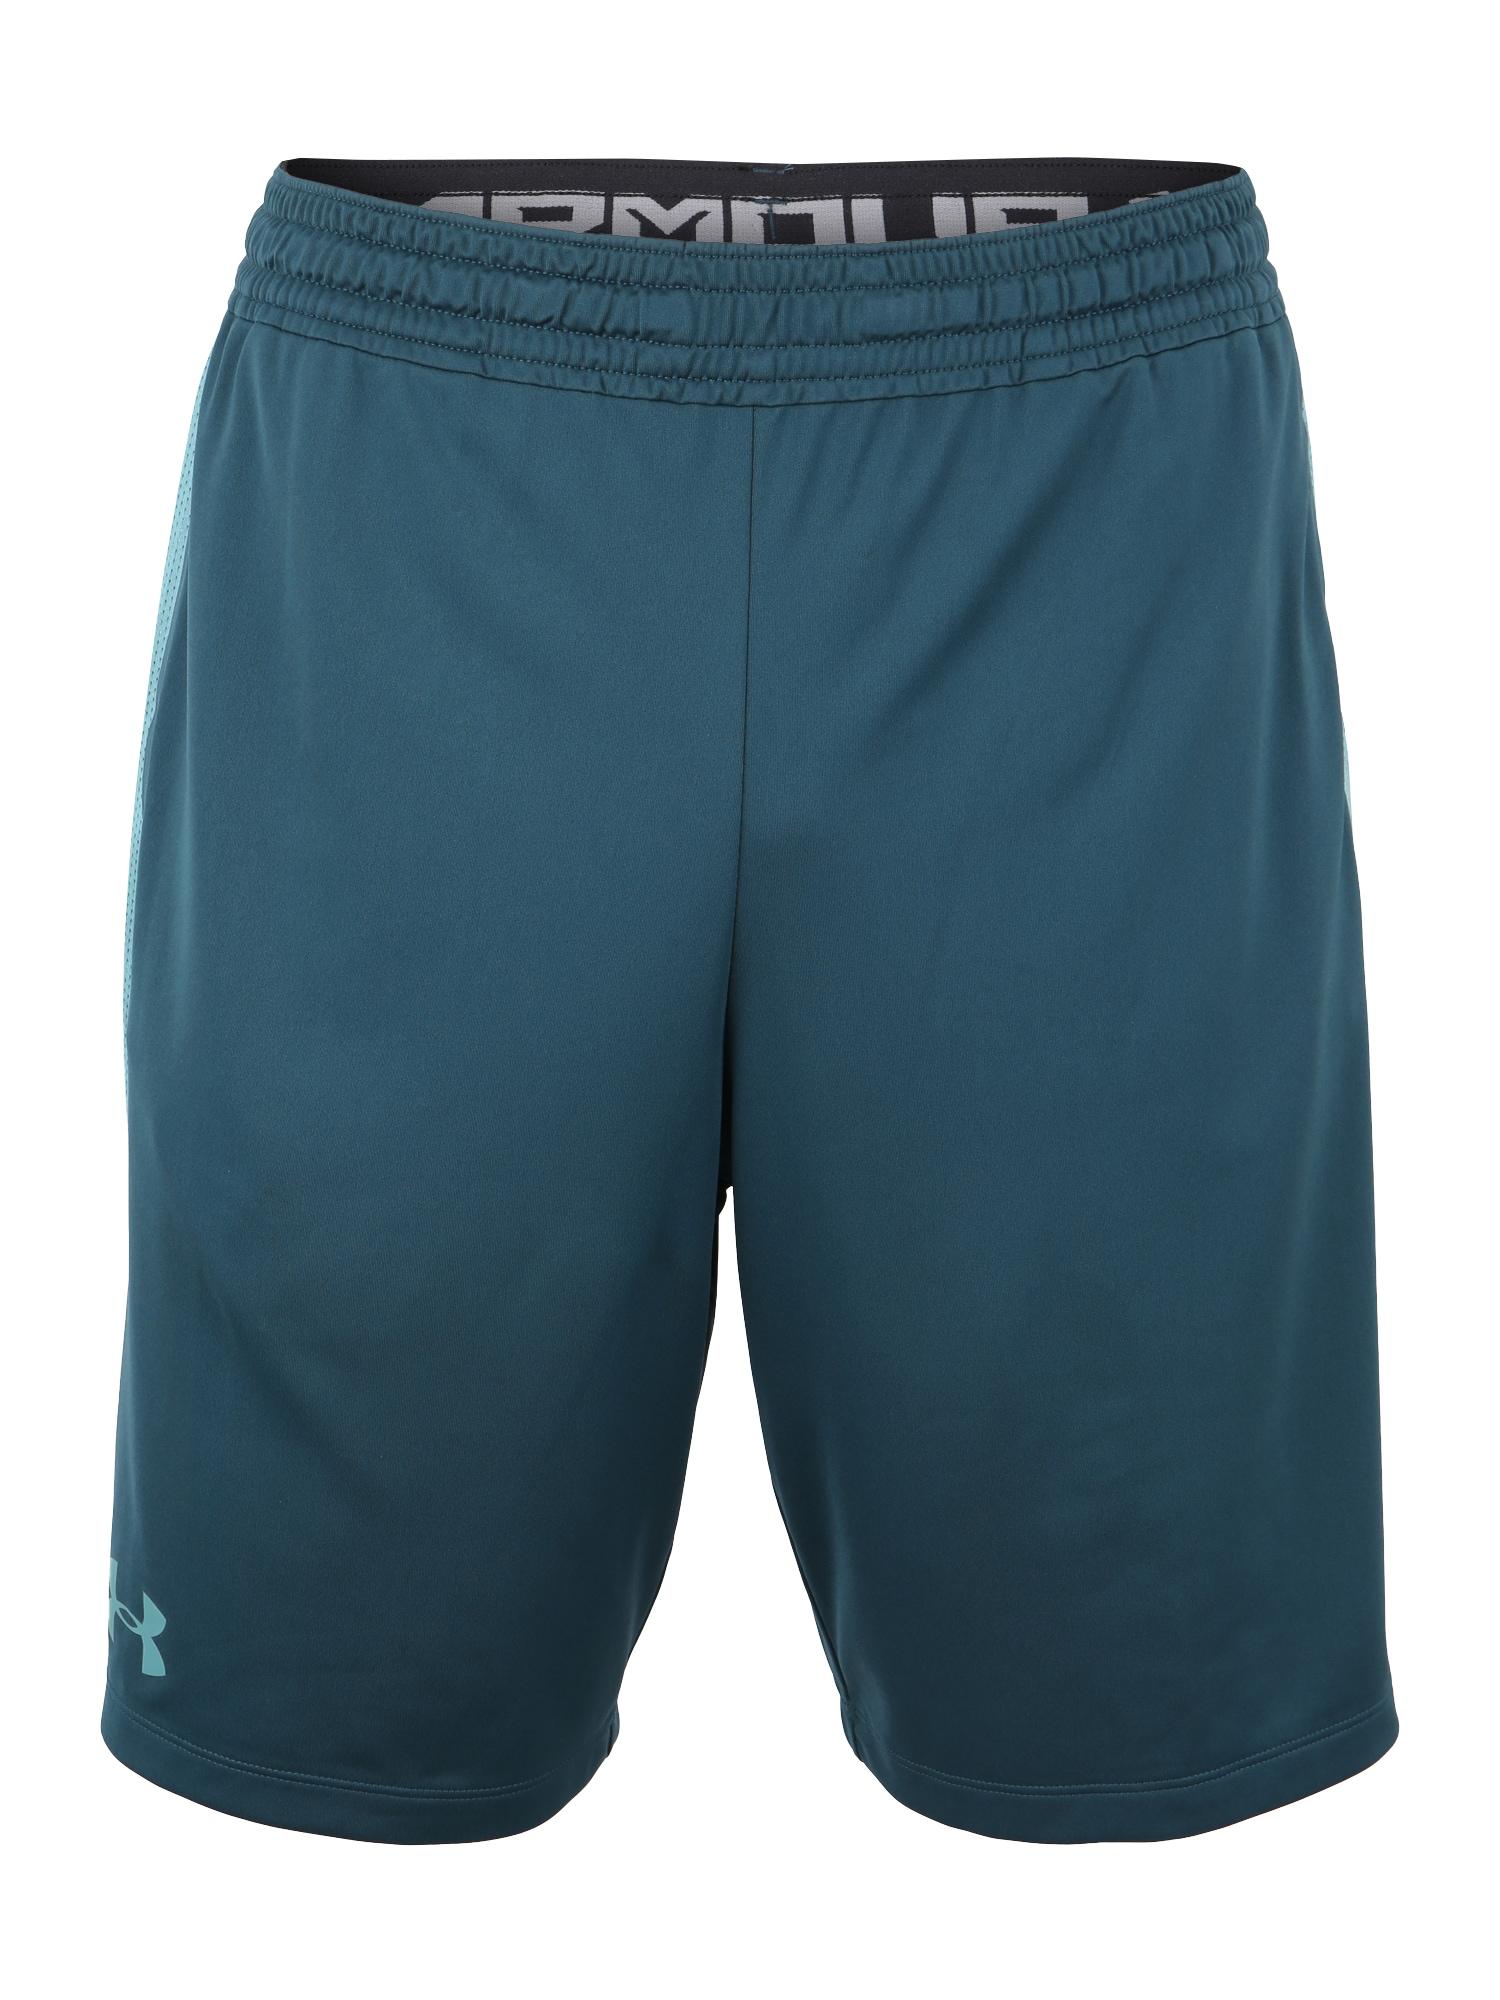 Sport-Shorts | Sportbekleidung > Sporthosen > Sportshorts | Türkis - Petrol | Under Armour